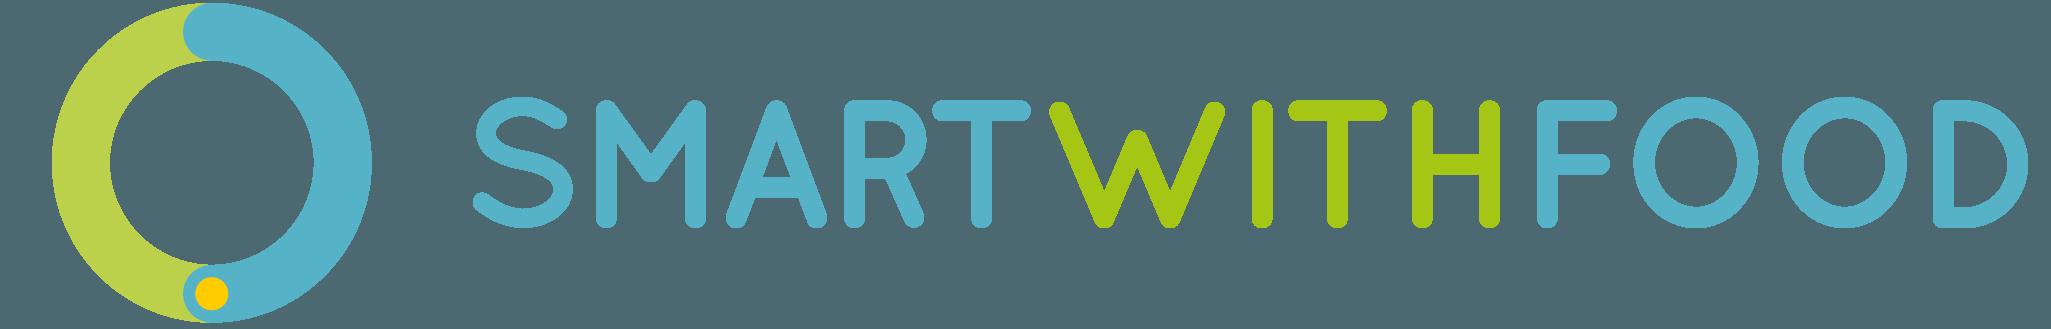 SmartWithFood